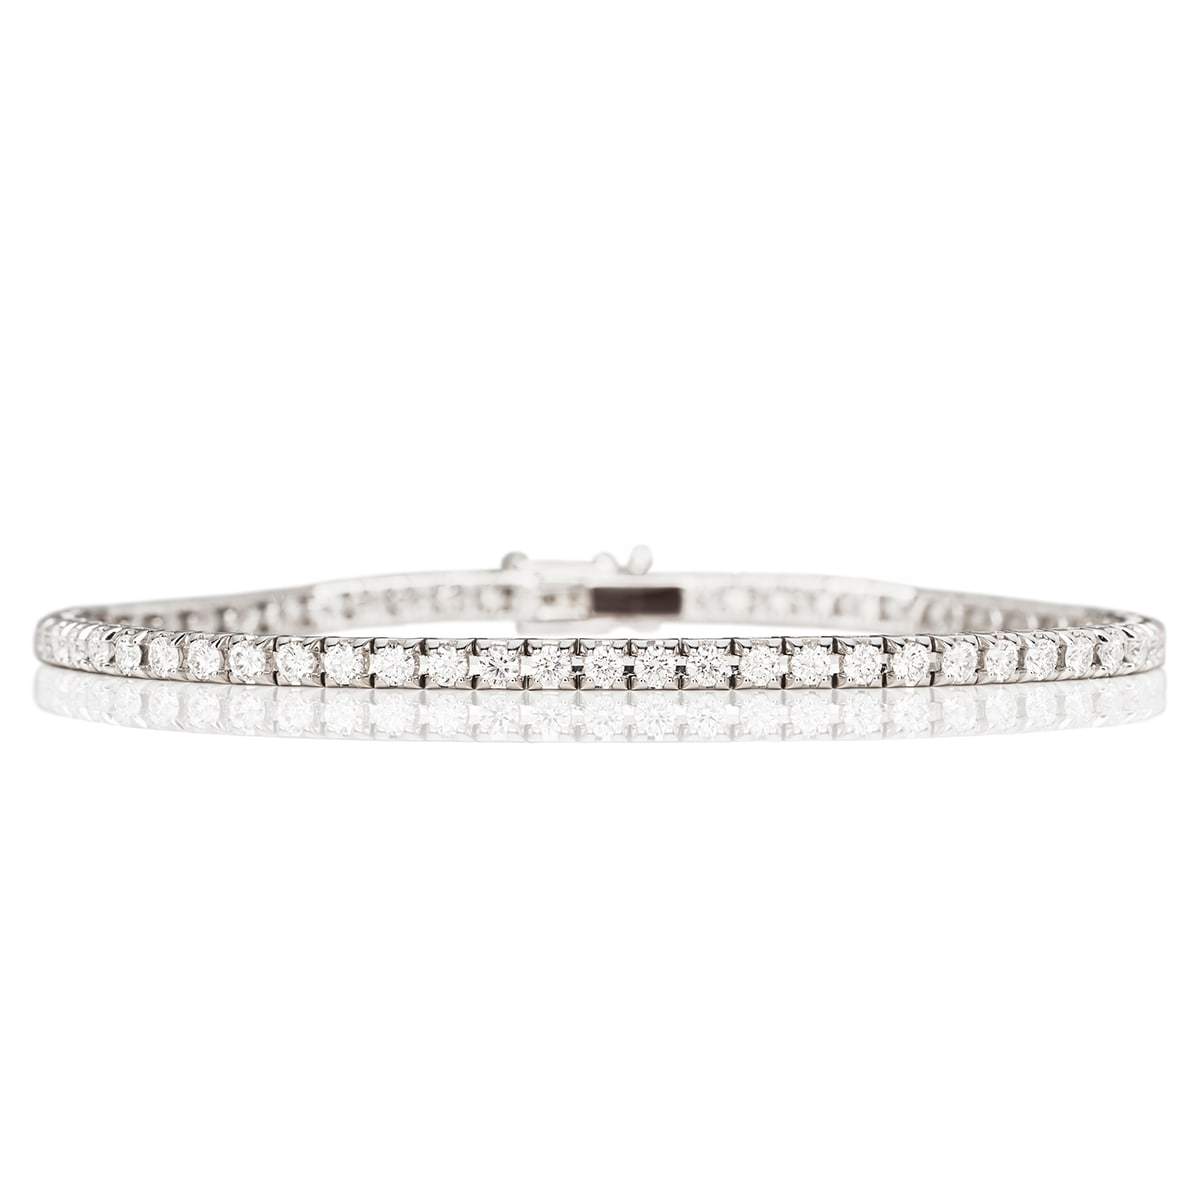 Sandin_Selected_IL_Riviera_VG_190703_0281_diamantarmband_hos_Jarl_Sandin